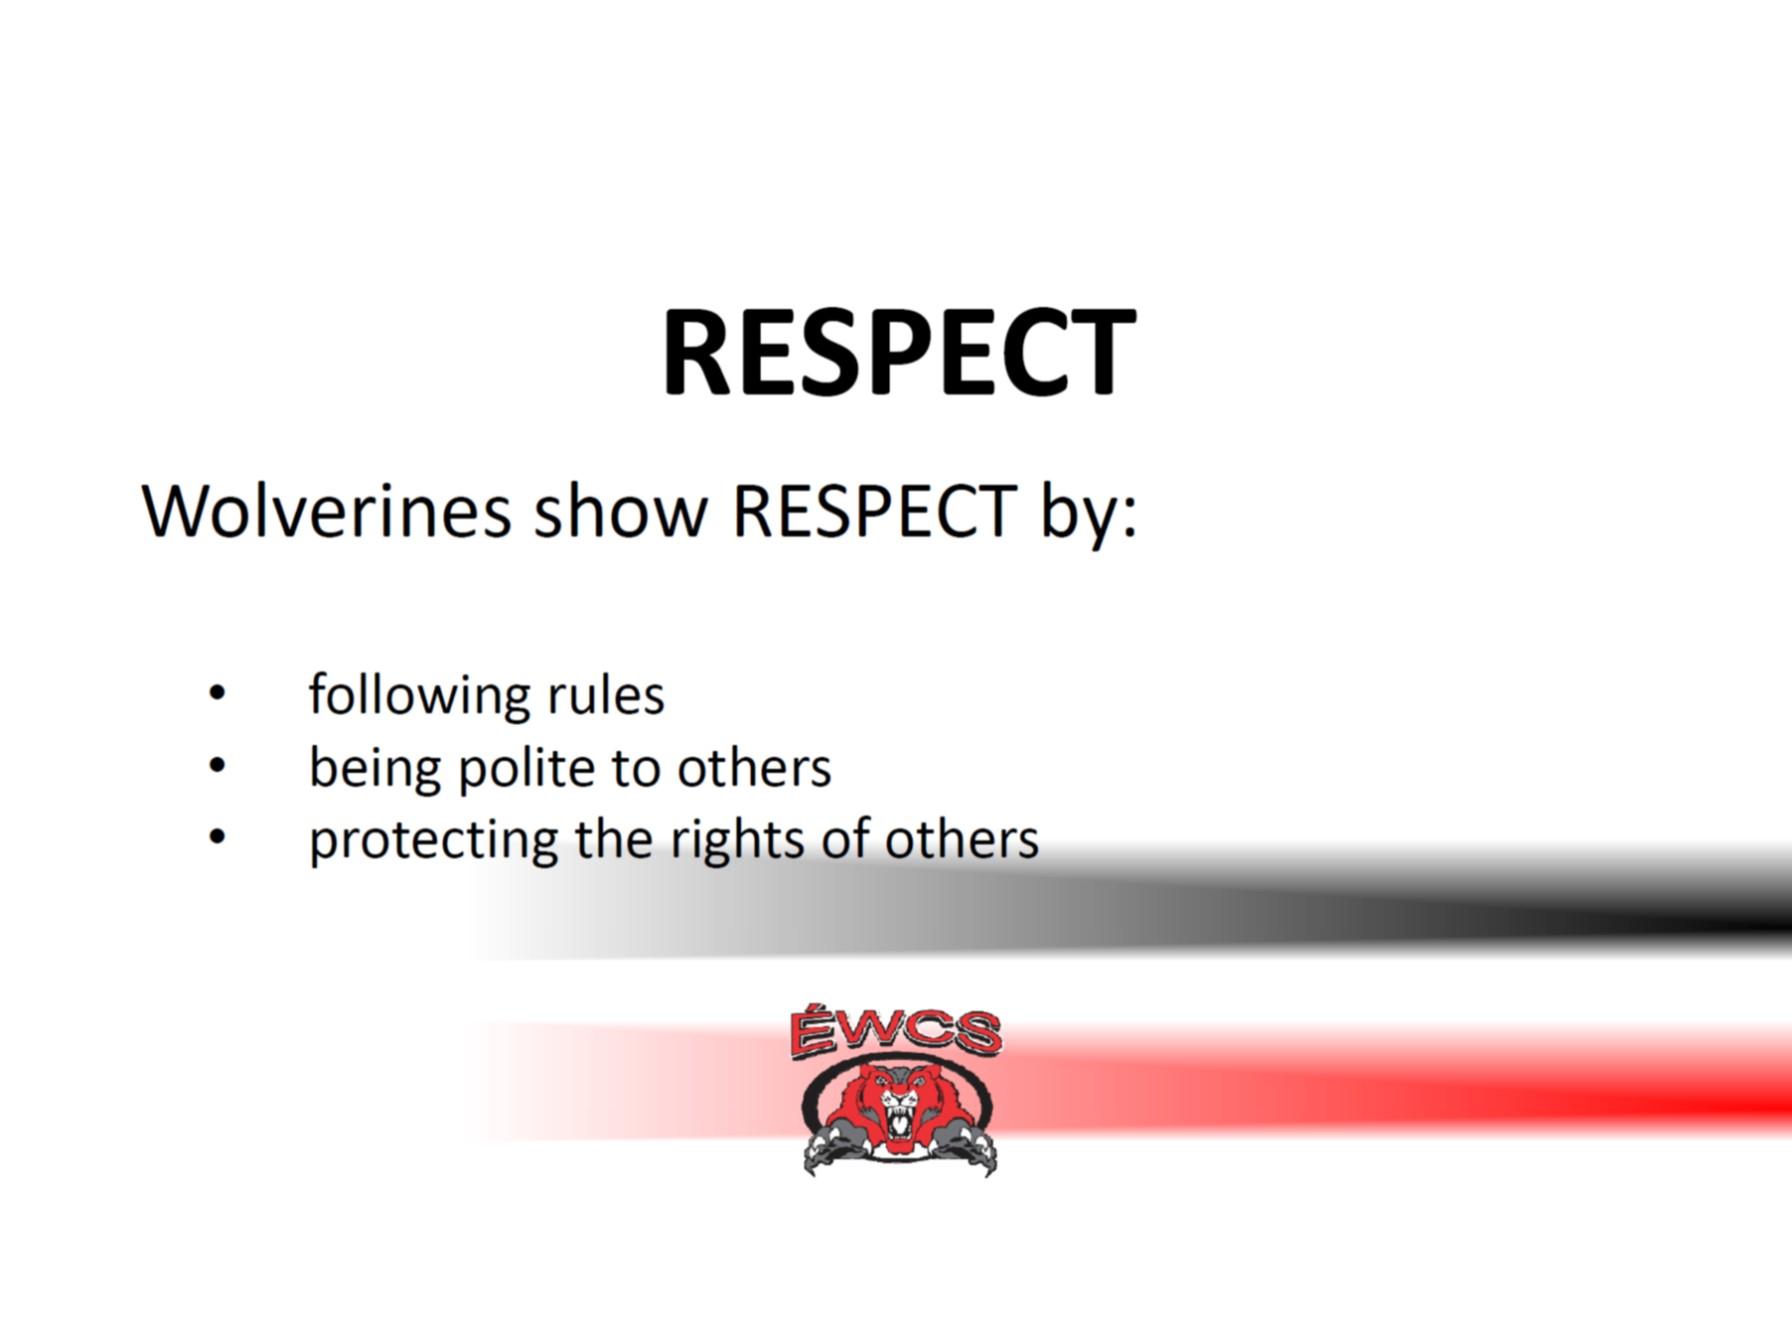 EWCS Values